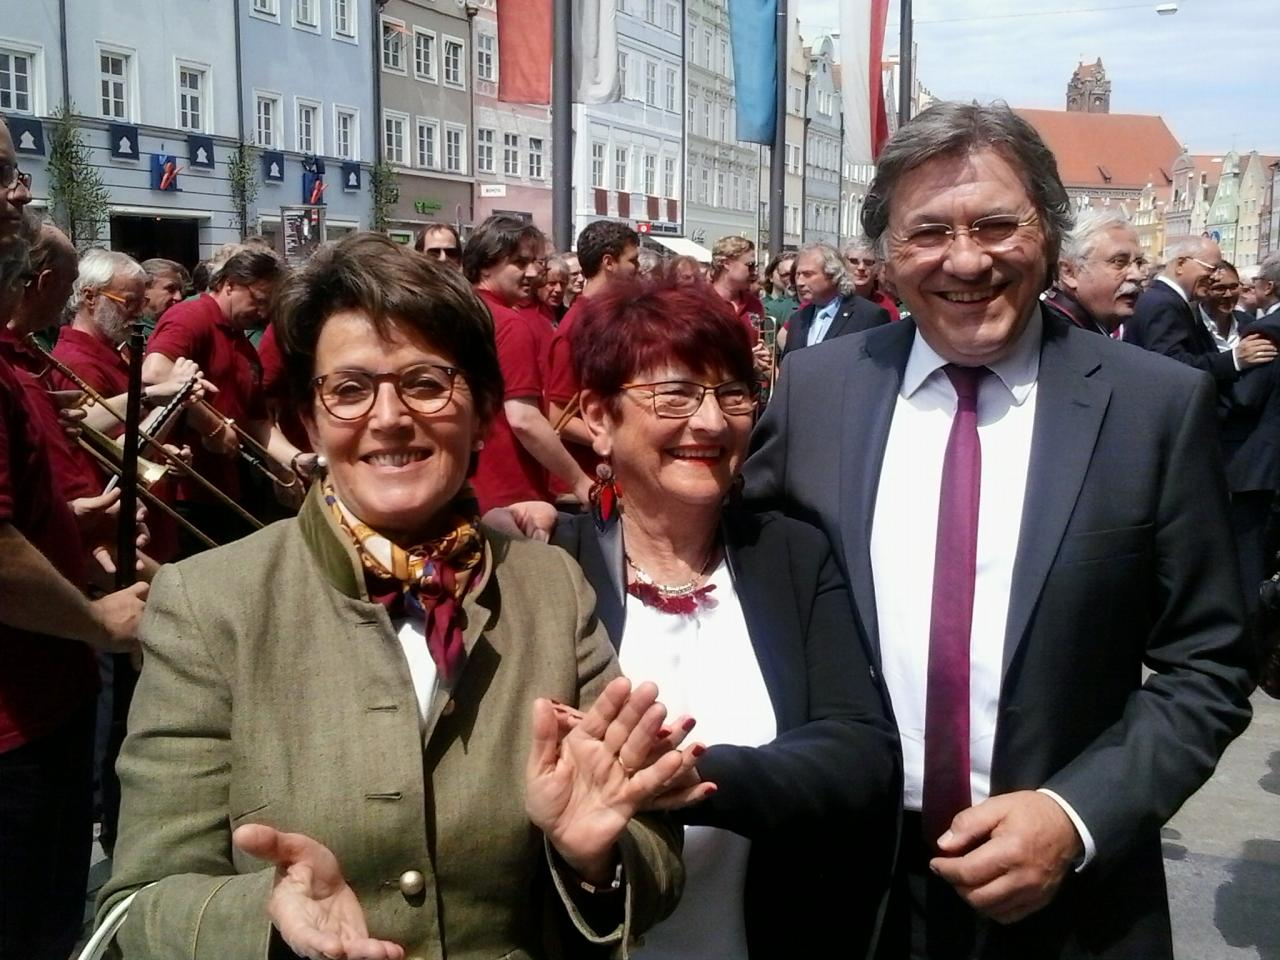 Gaby Gewies, Michèle et Josef Obermeier